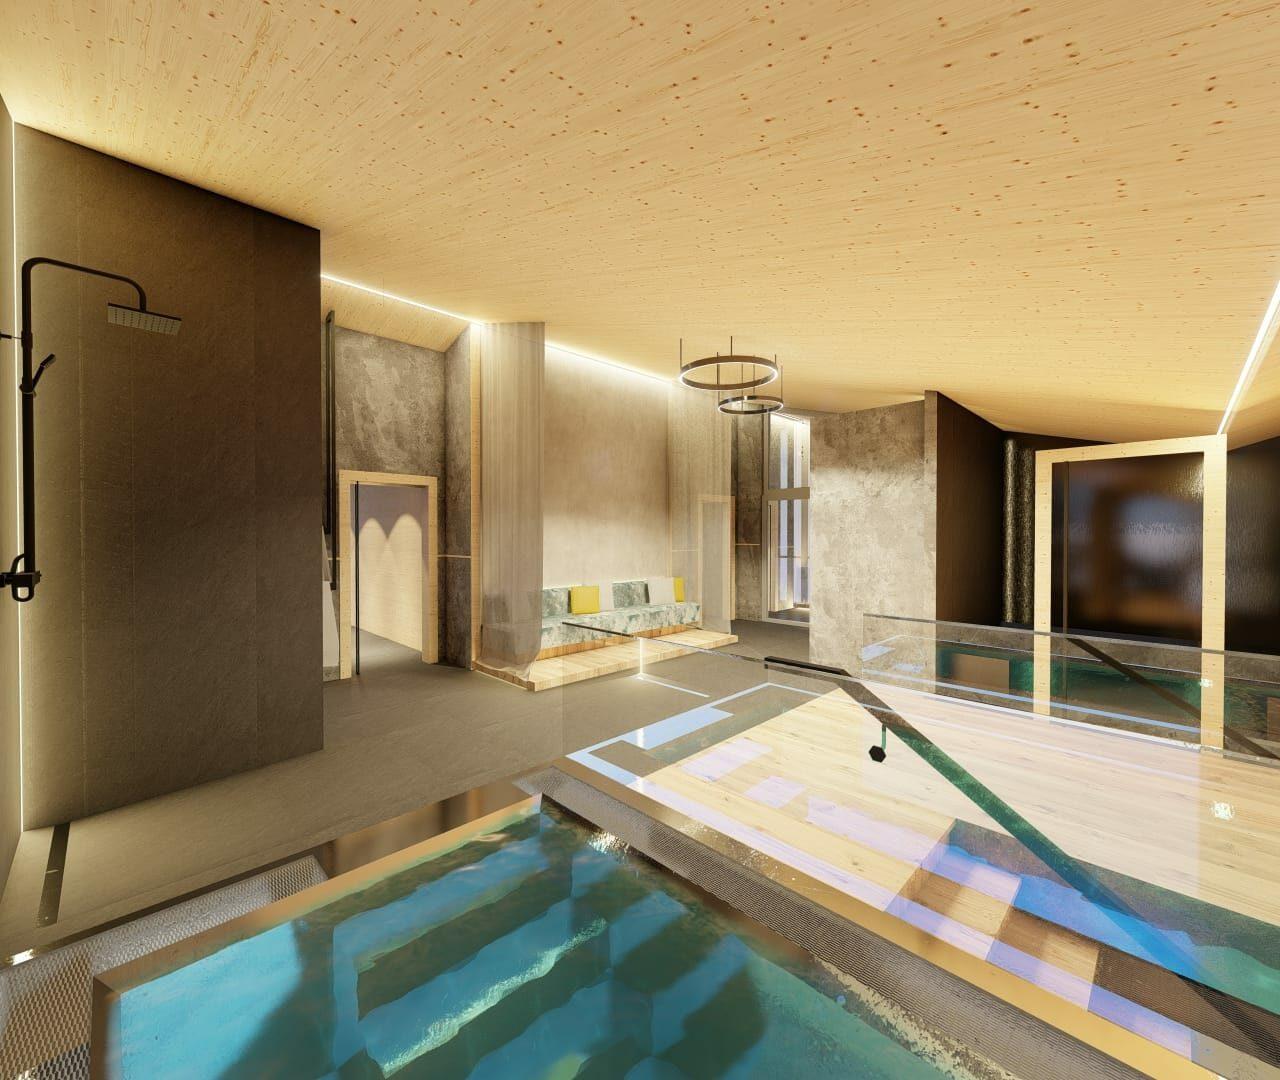 HOFGUT Apartment & Lifestyle Resort – Wagrain Salzburg Dachsauna